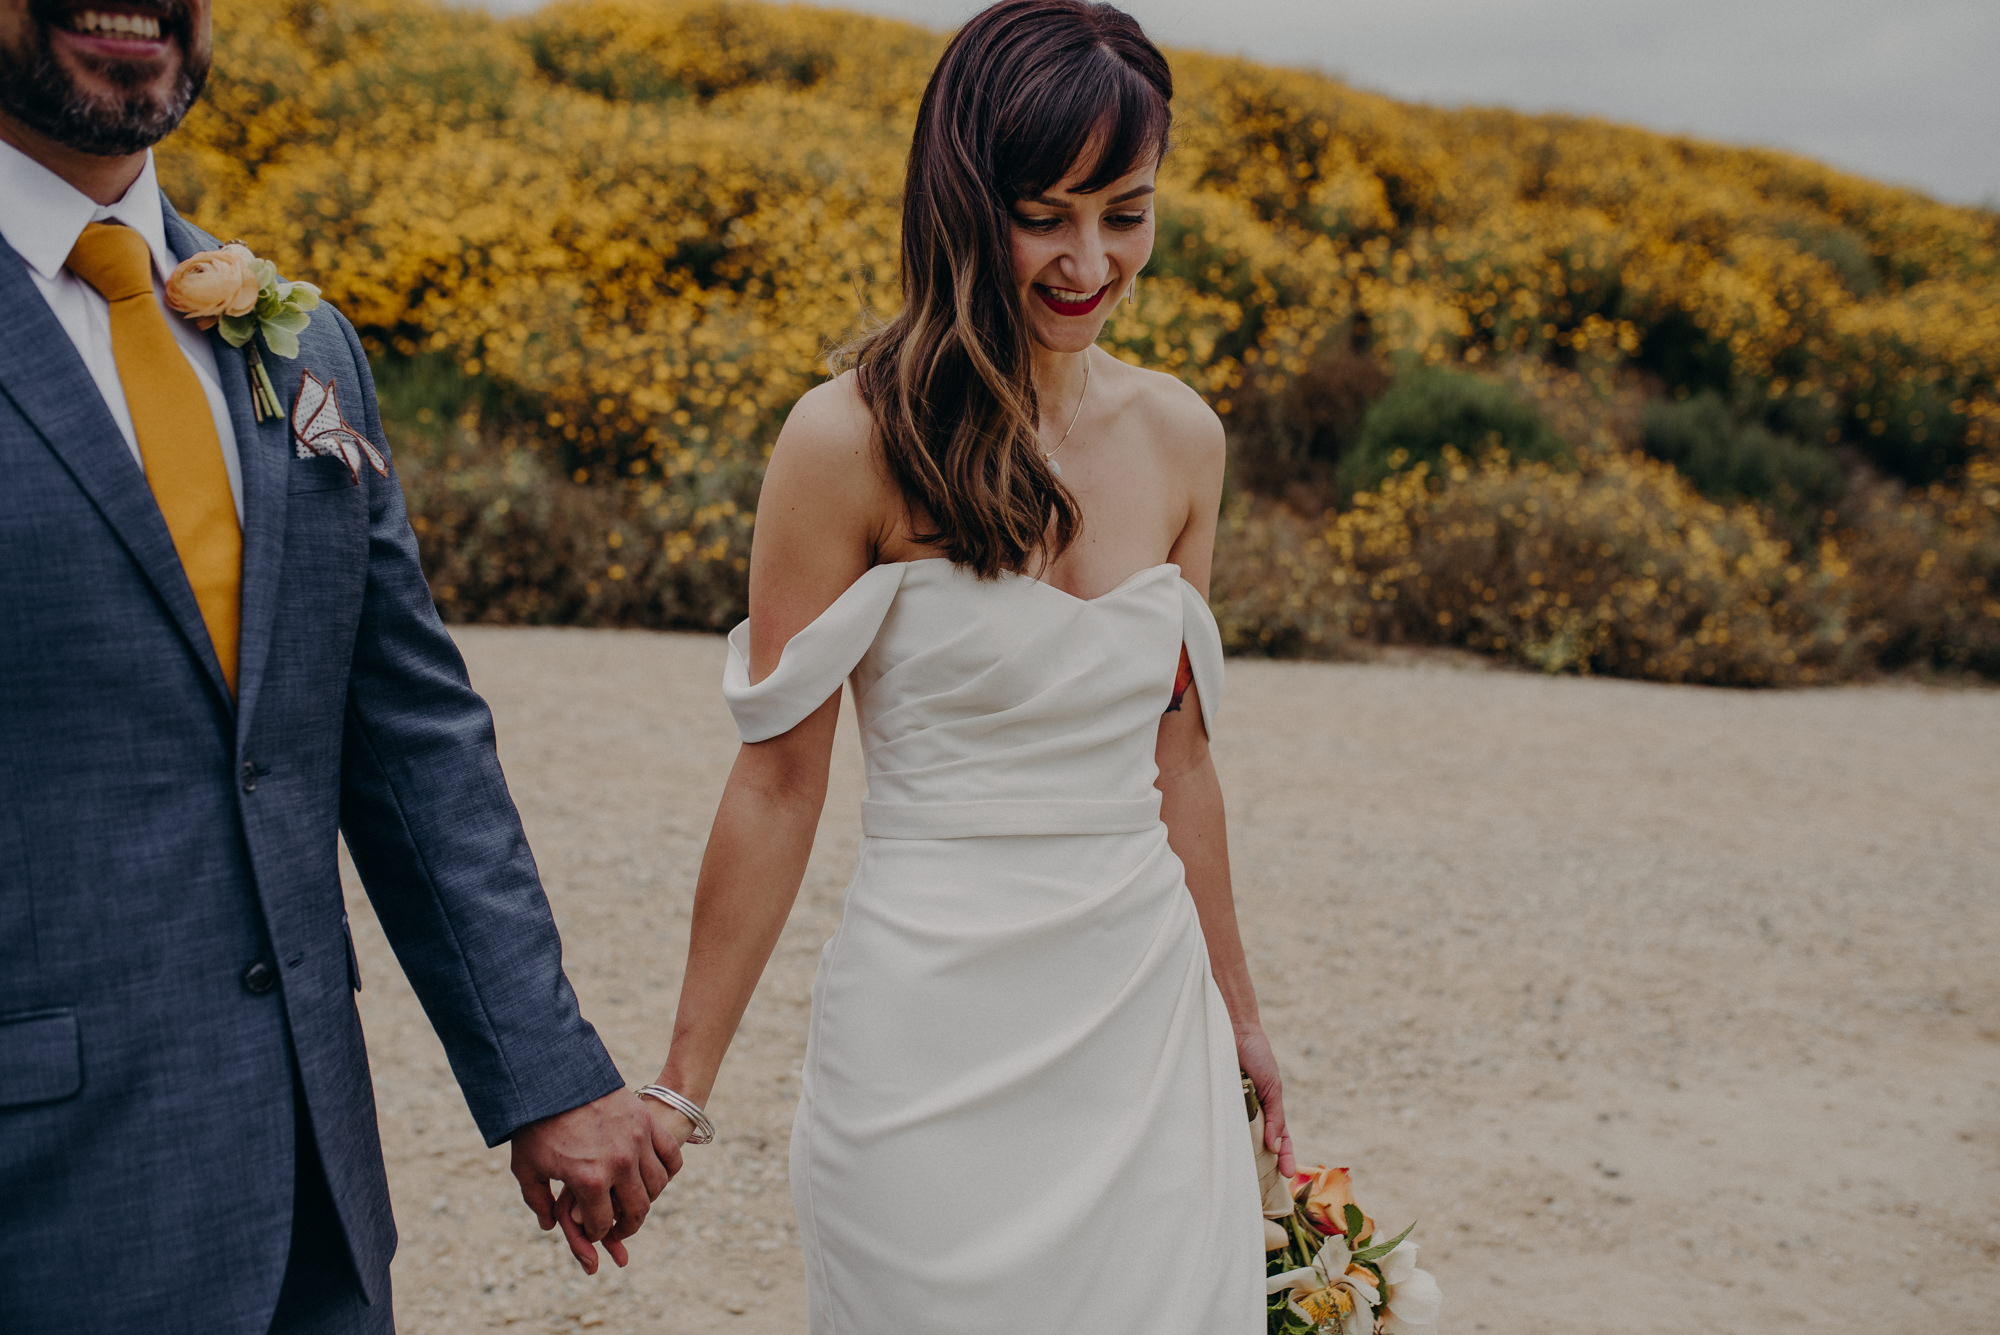 elopement photographer in los angeles - la wedding photographer - isaiahandtaylor.com-023.jpg